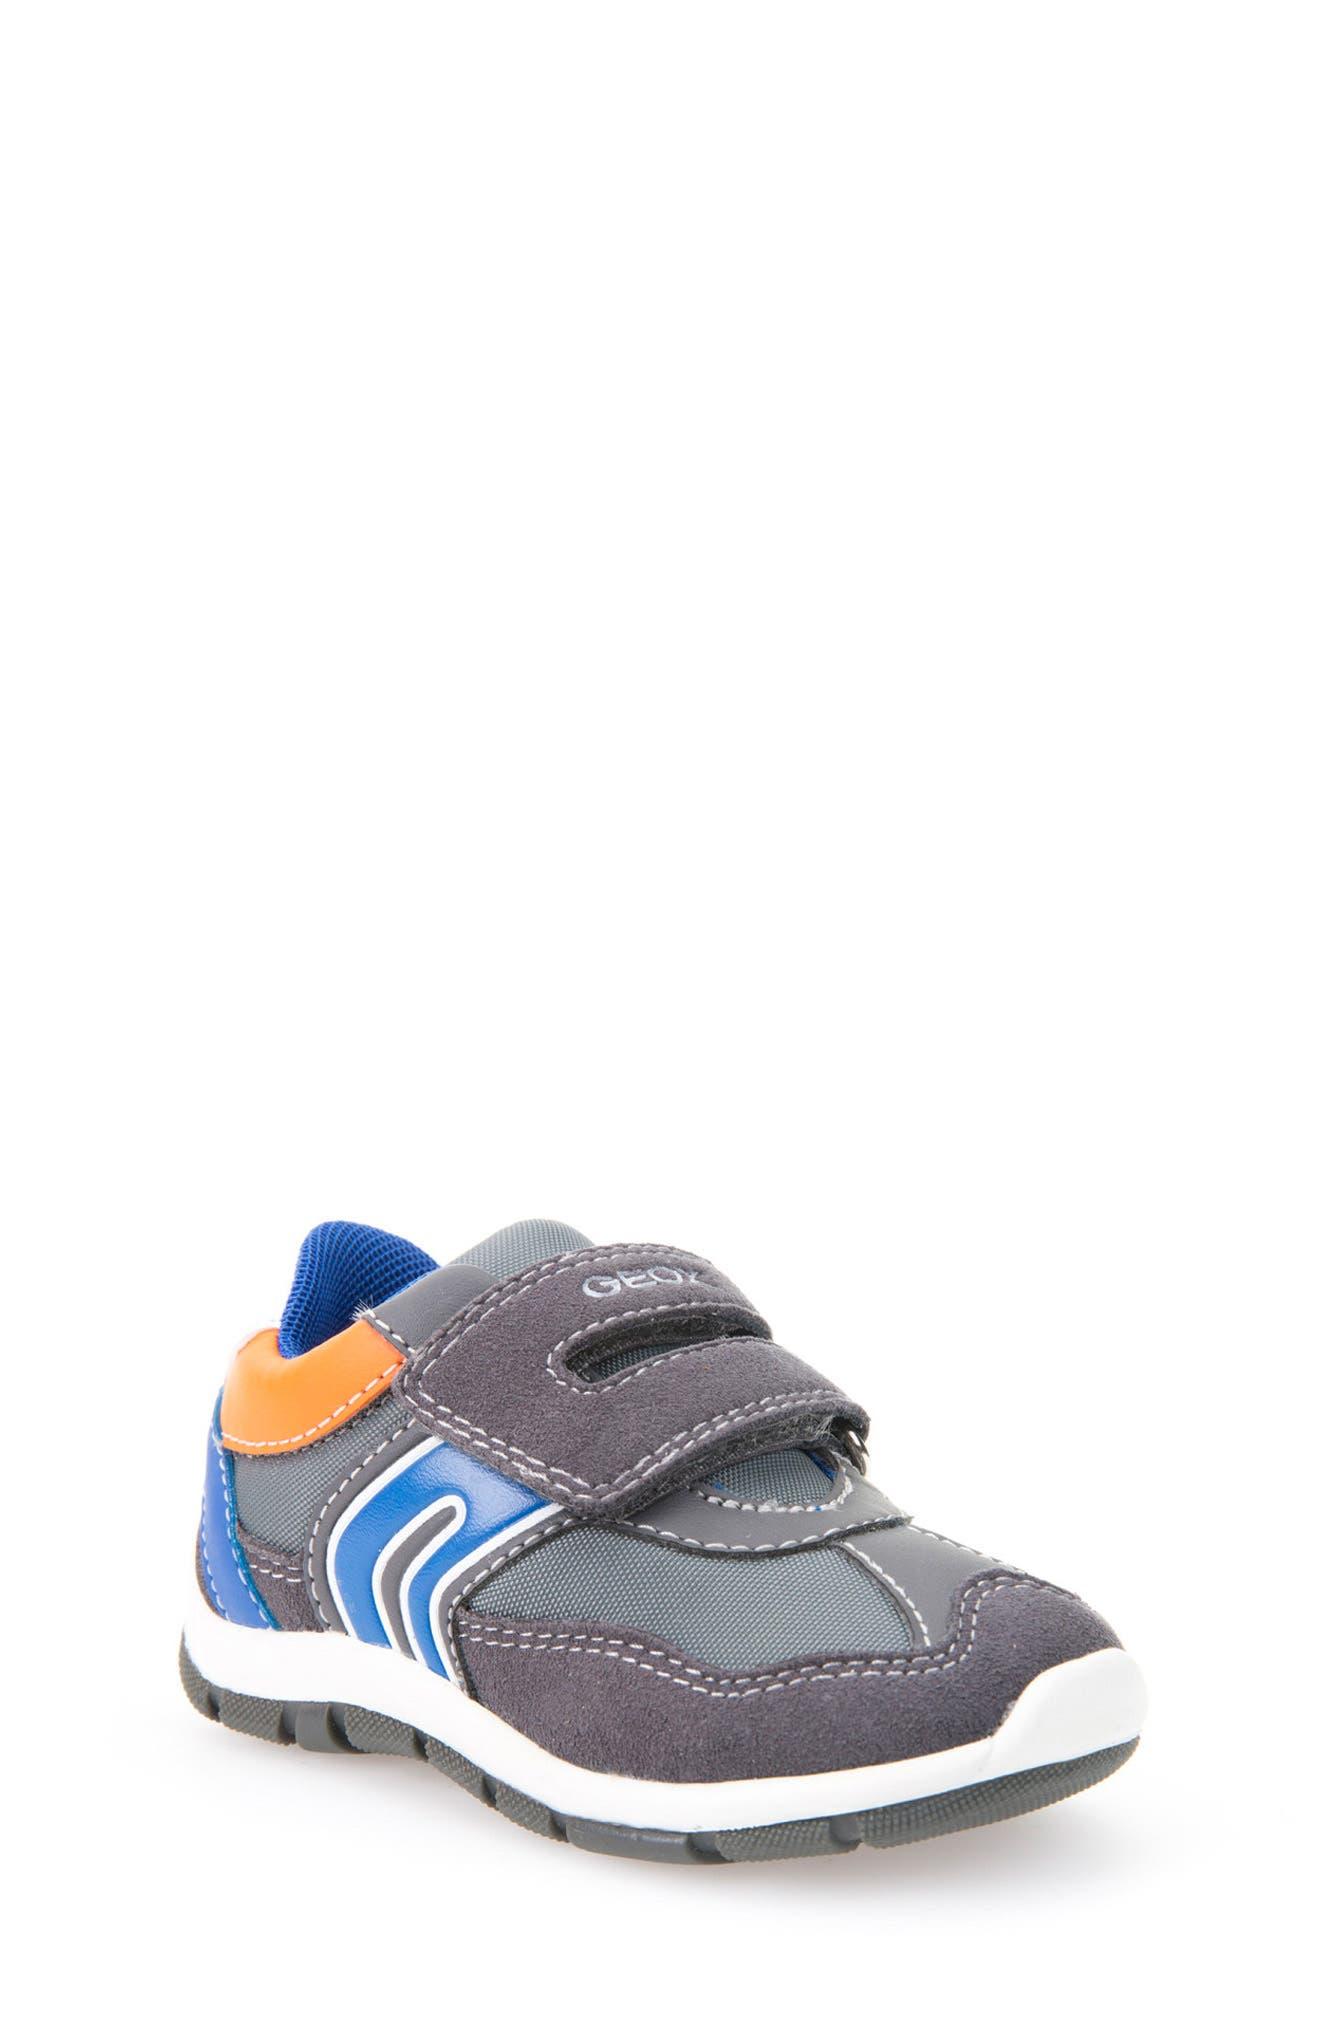 Shaax Sneaker,                             Main thumbnail 1, color,                             073